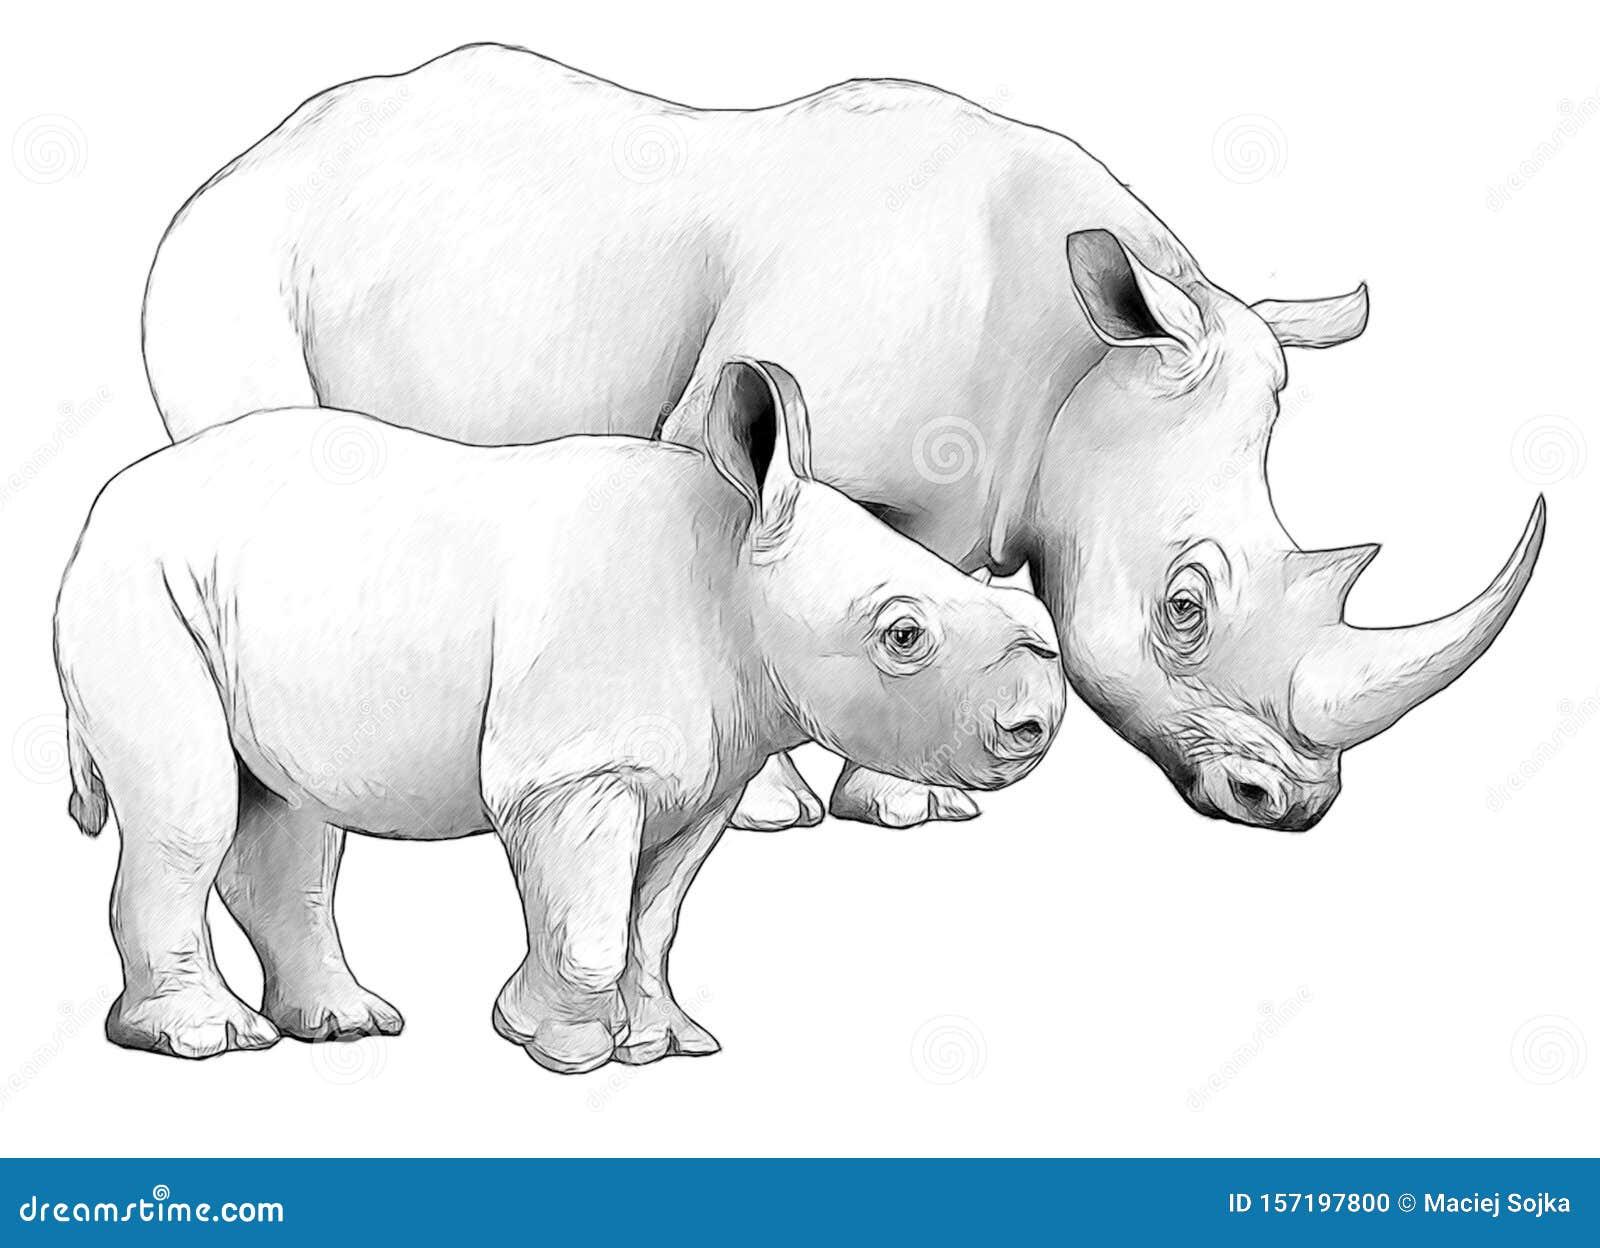 Cartoon Scene With Rhinoceros Safari Animal Coloring Page Stock Illustration Illustration Of Nature Mammal 157197800